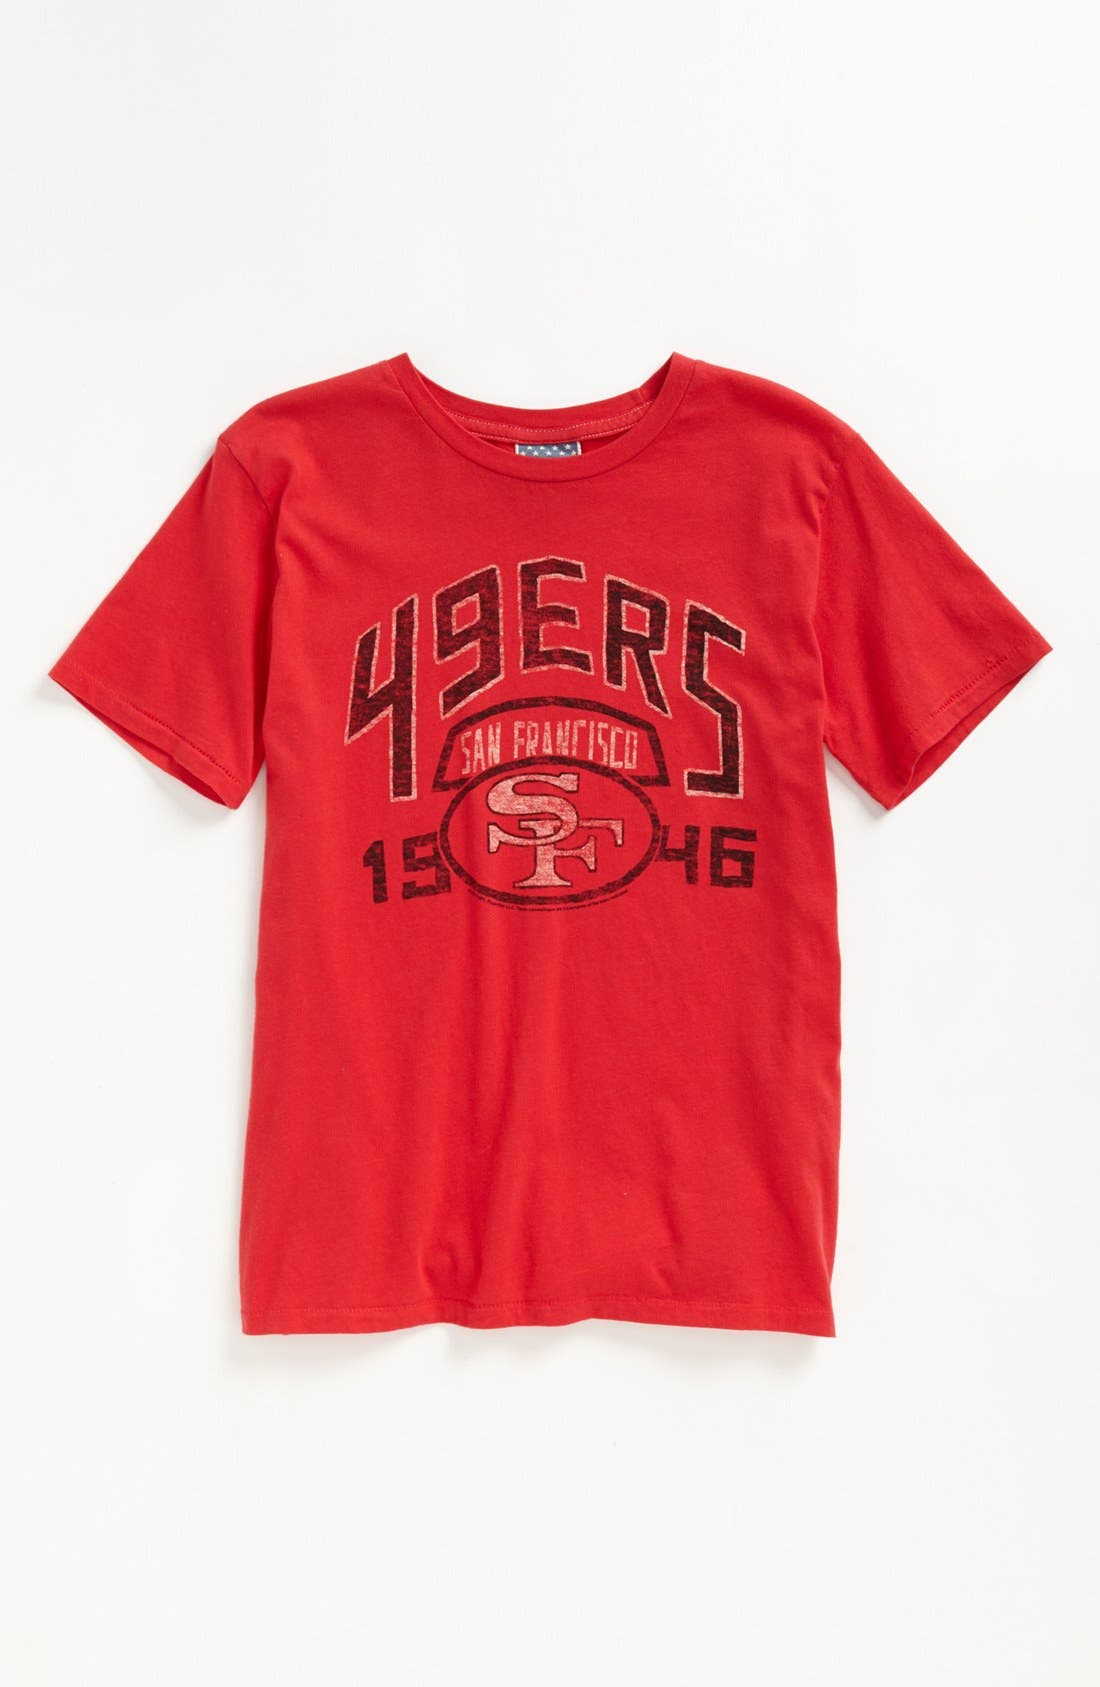 Alternate Image 1 Selected - Junk Food 'San Francisco 49ers' T-Shirt (Big Boys)